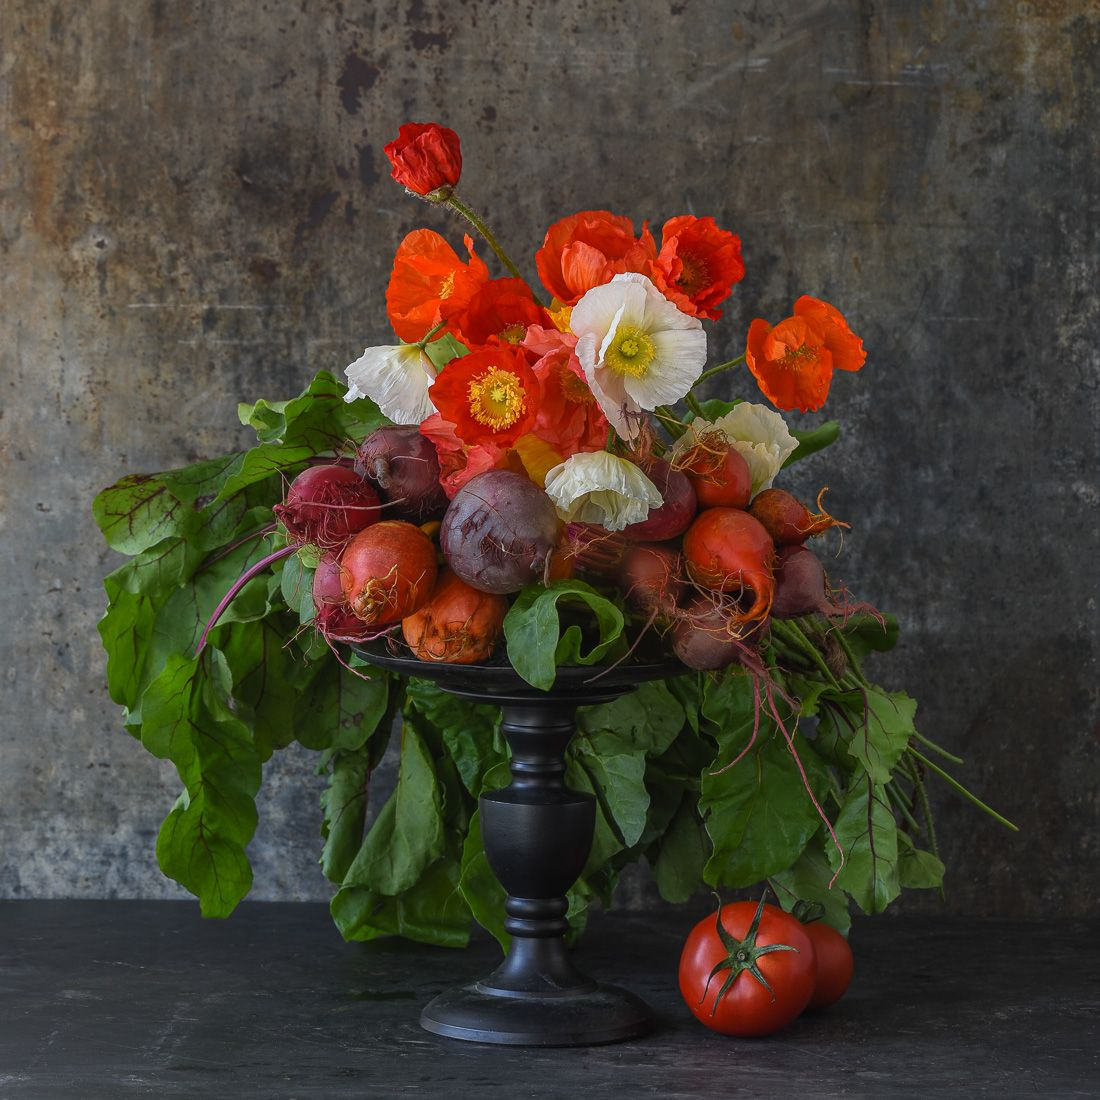 Lynn Lynn Karlin_Bouquet of Poppies & Beets-25.jpg